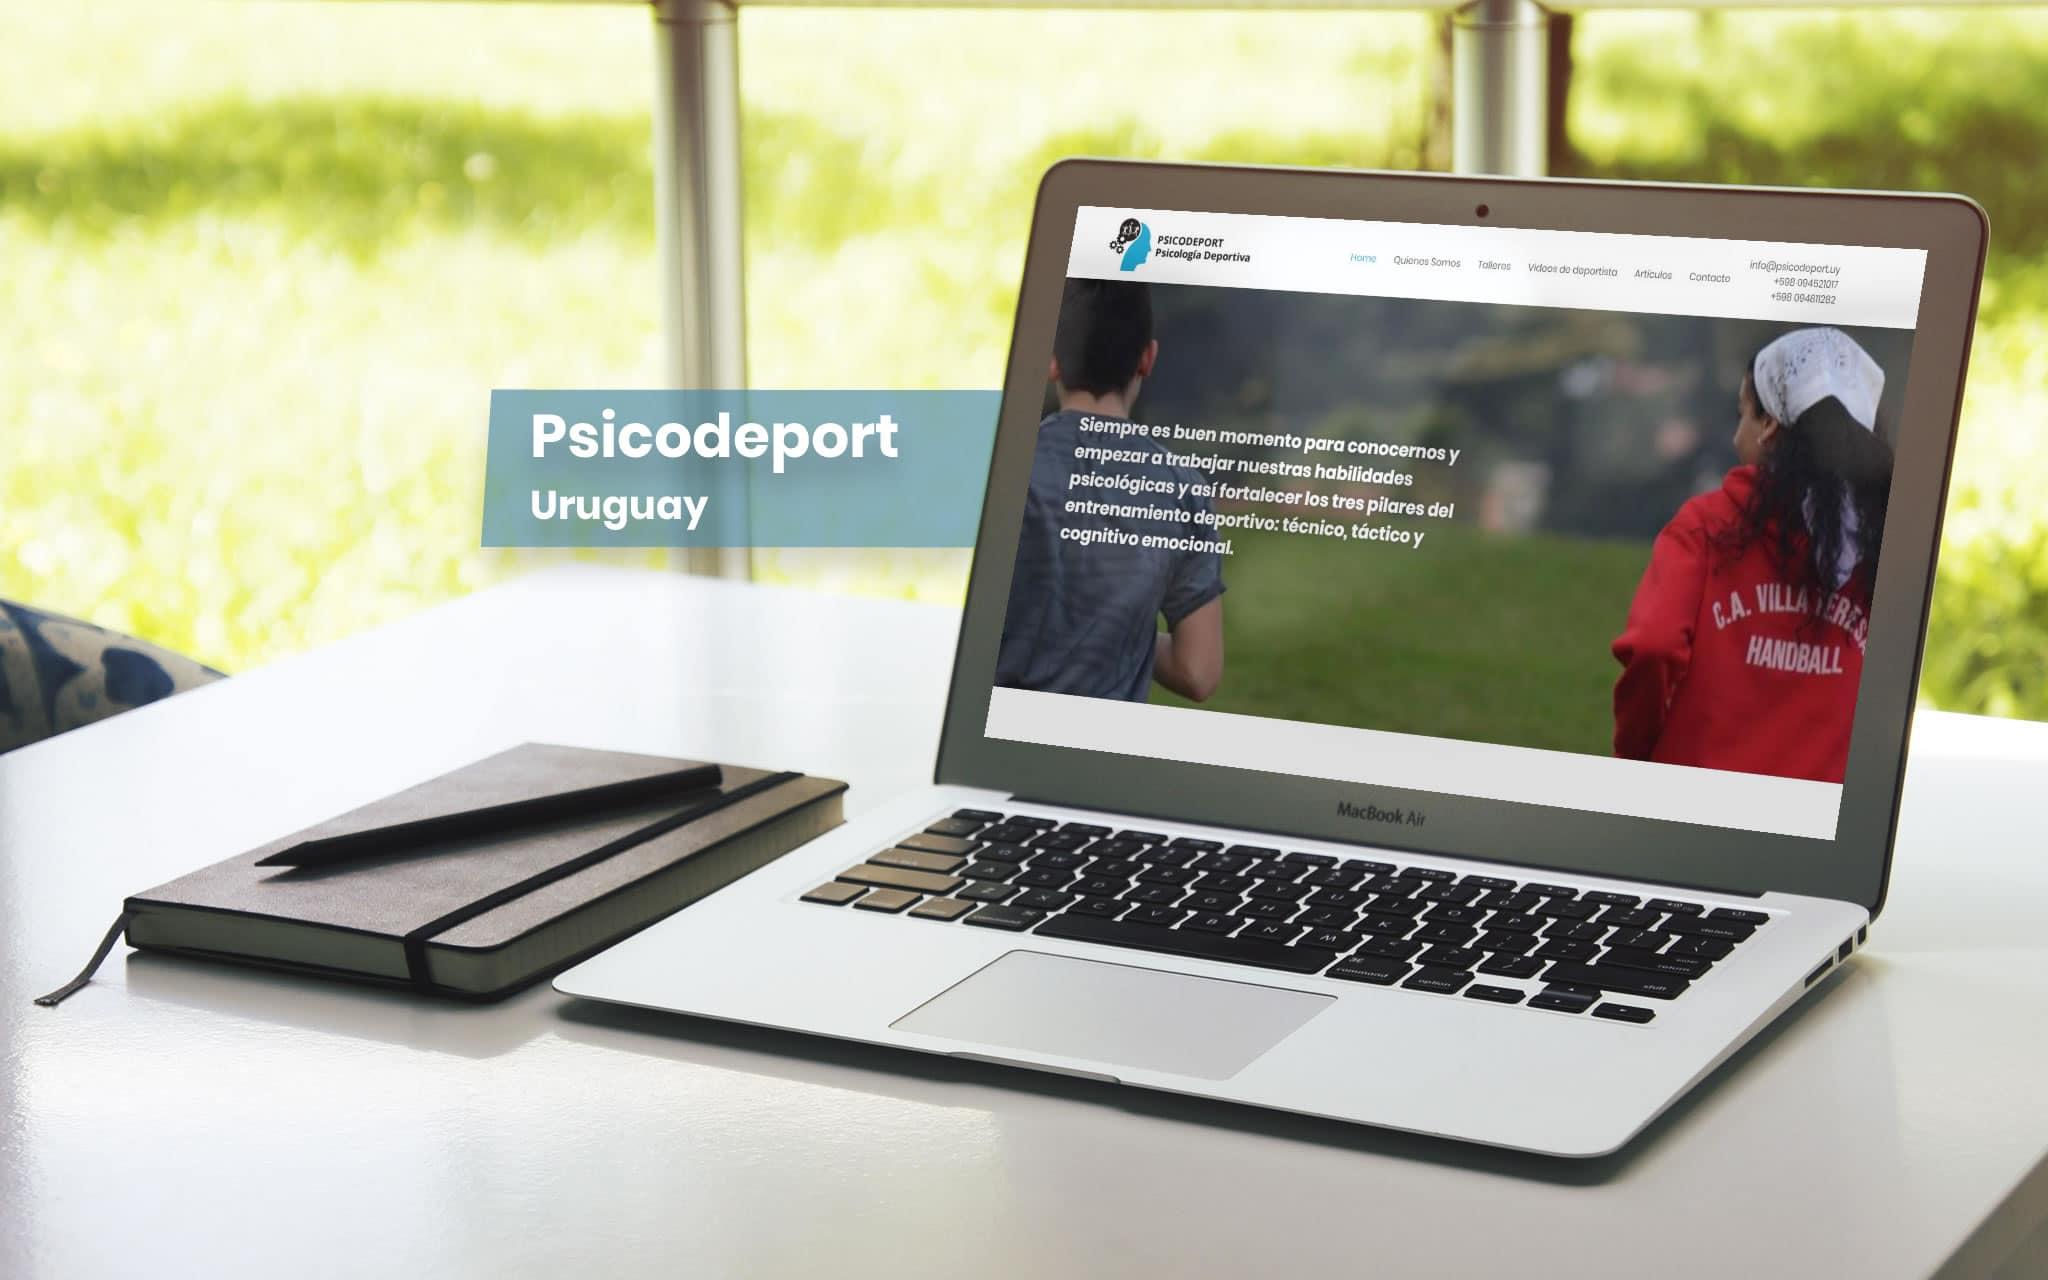 Psicodeport - Uruguay